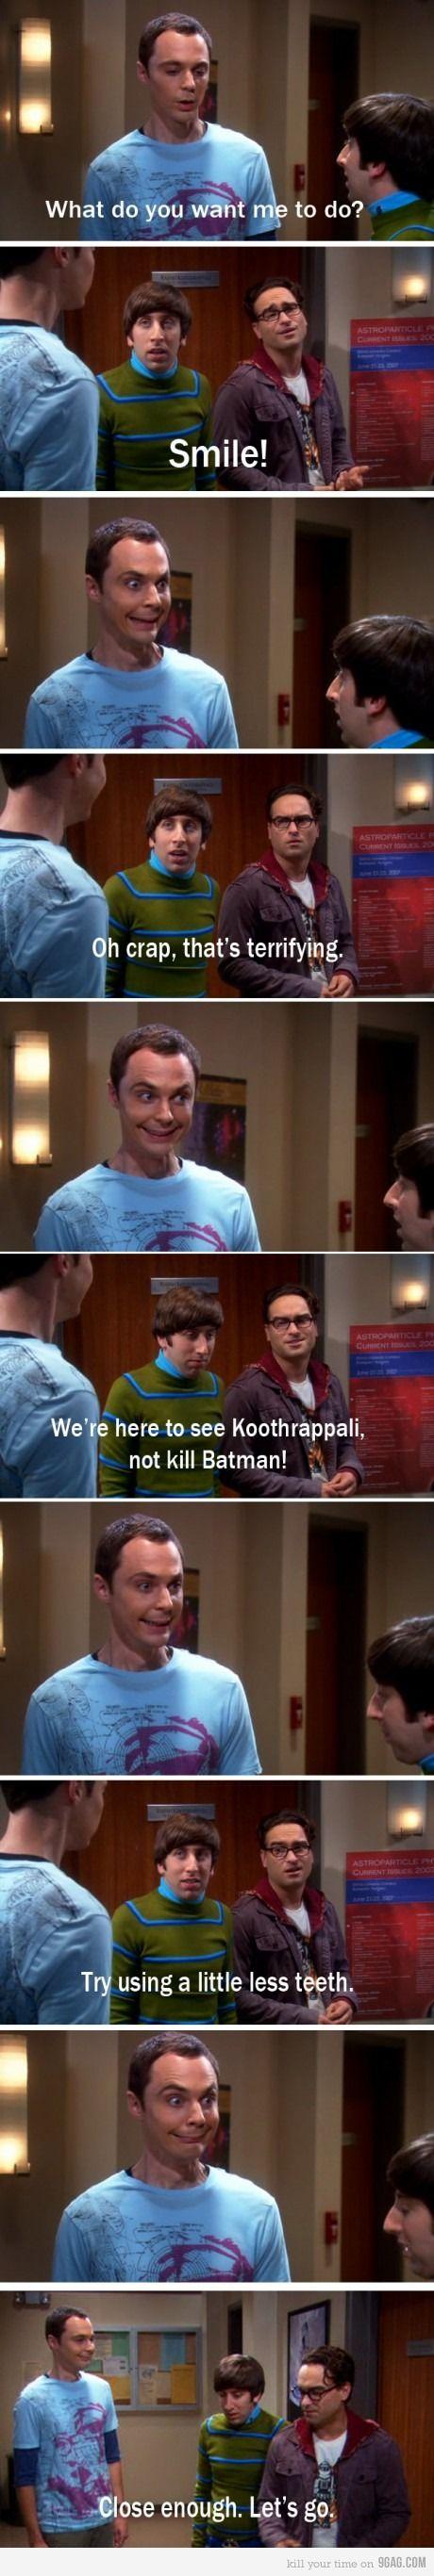 Oh Sheldon lol